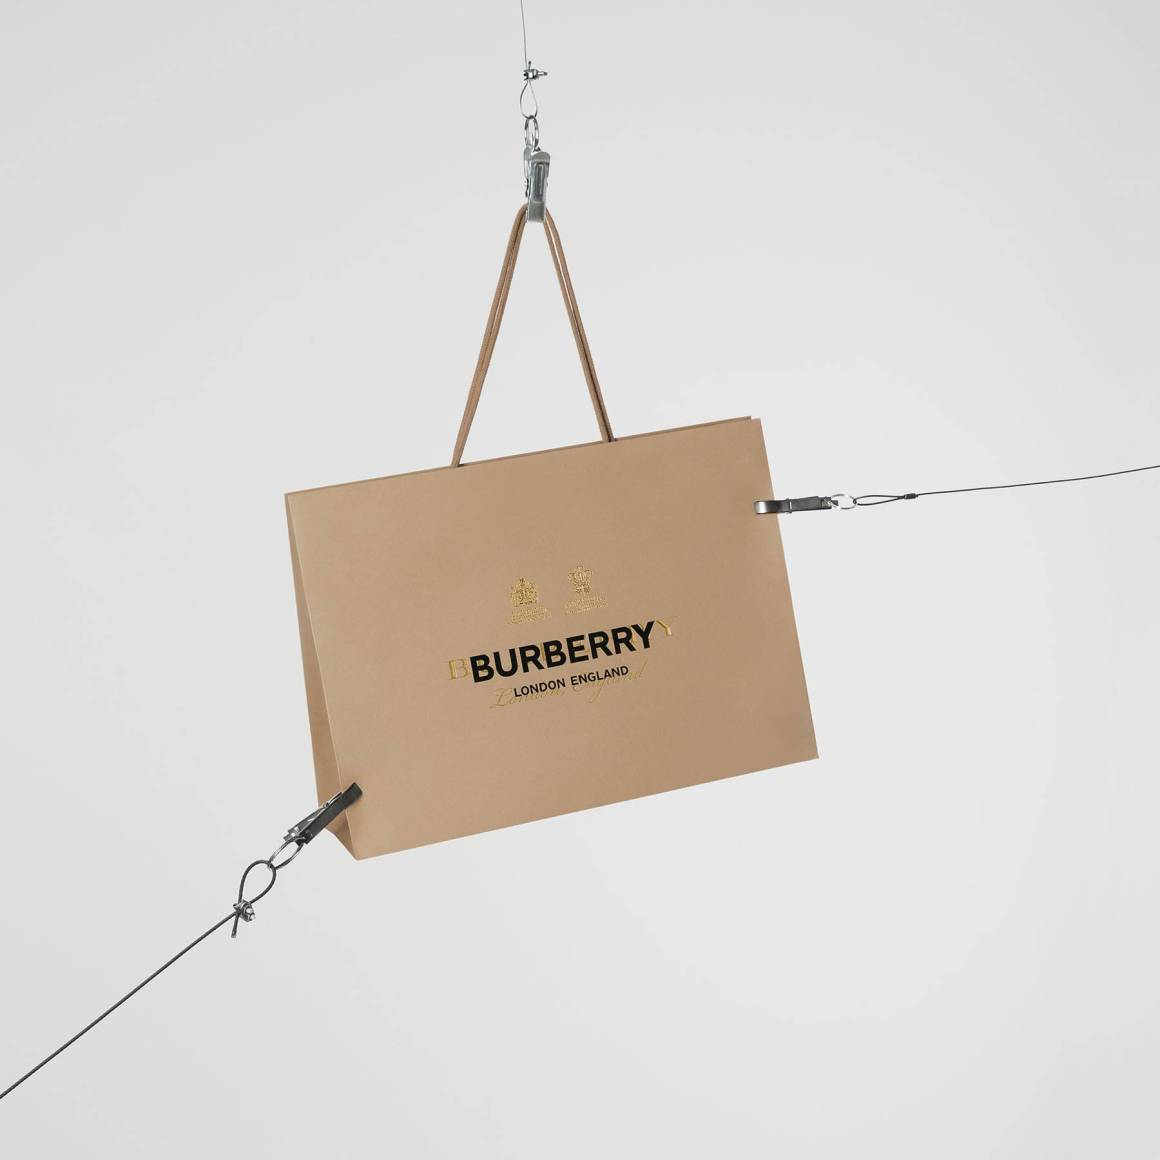 burberry-24-hour-product-releases-instagram-wechat-and-121-regent-street.jpg